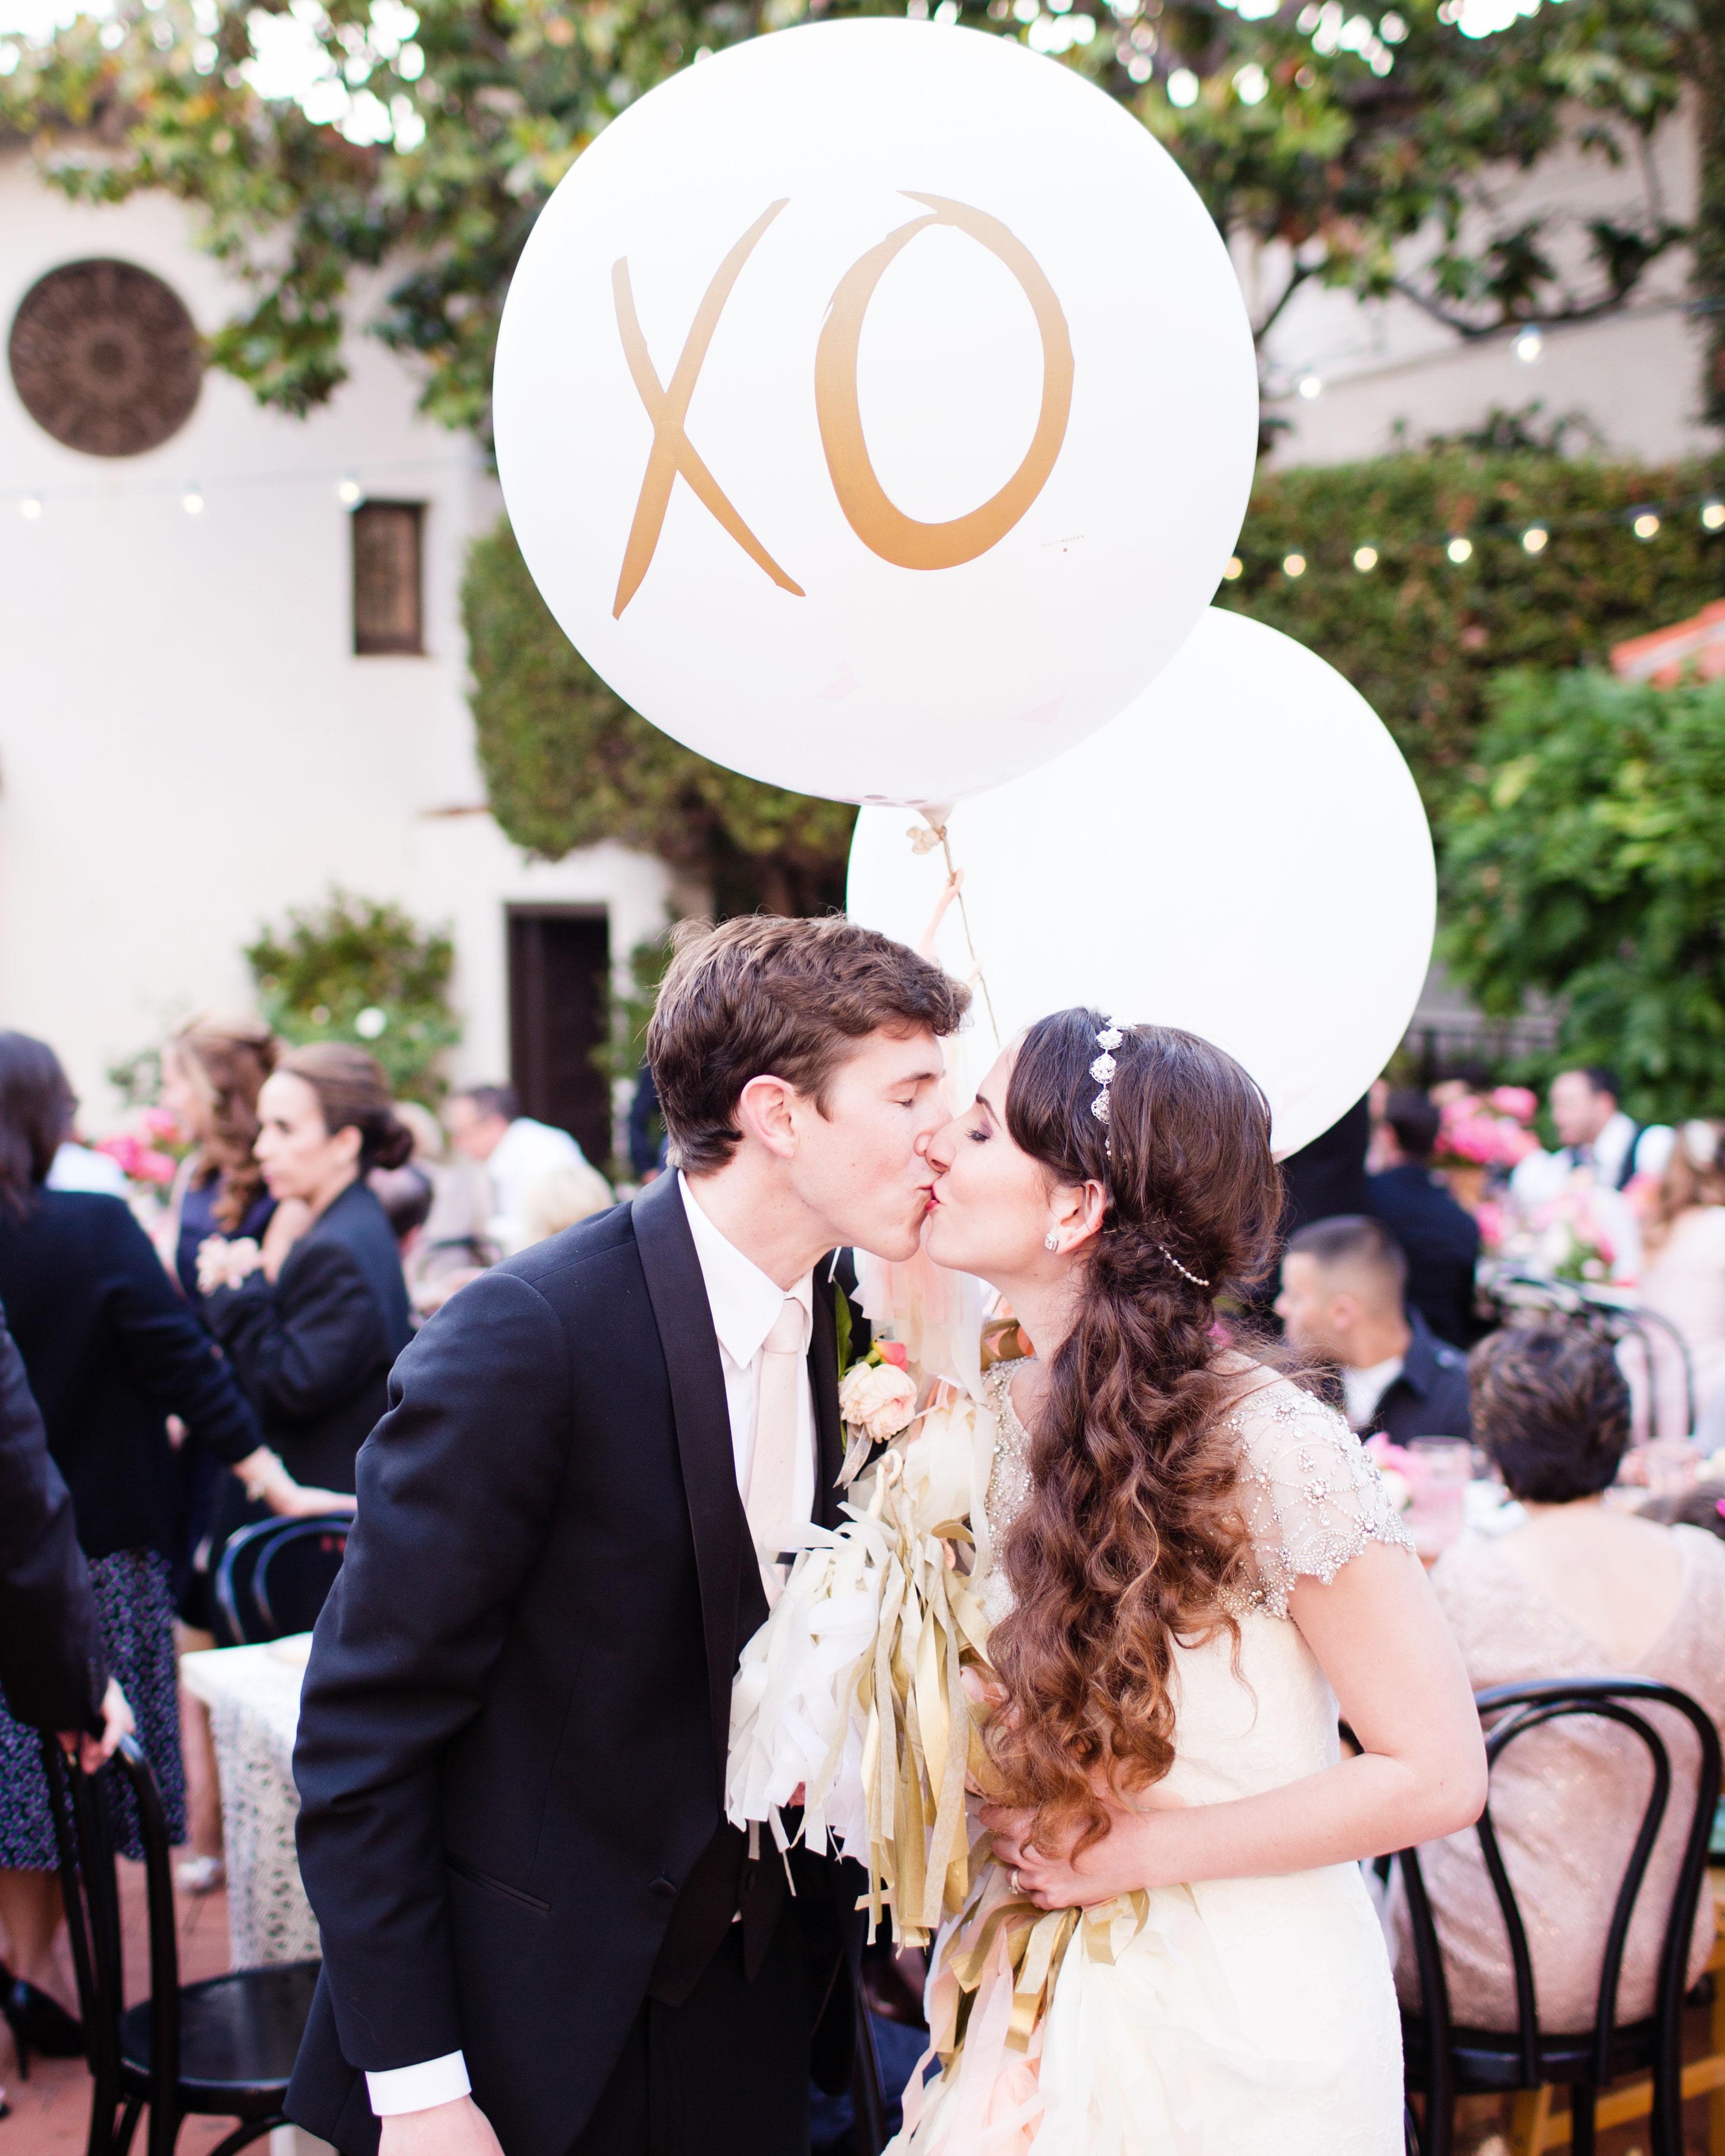 richelle-tom-wedding-kiss-balloons-826-s112855-0416.jpg